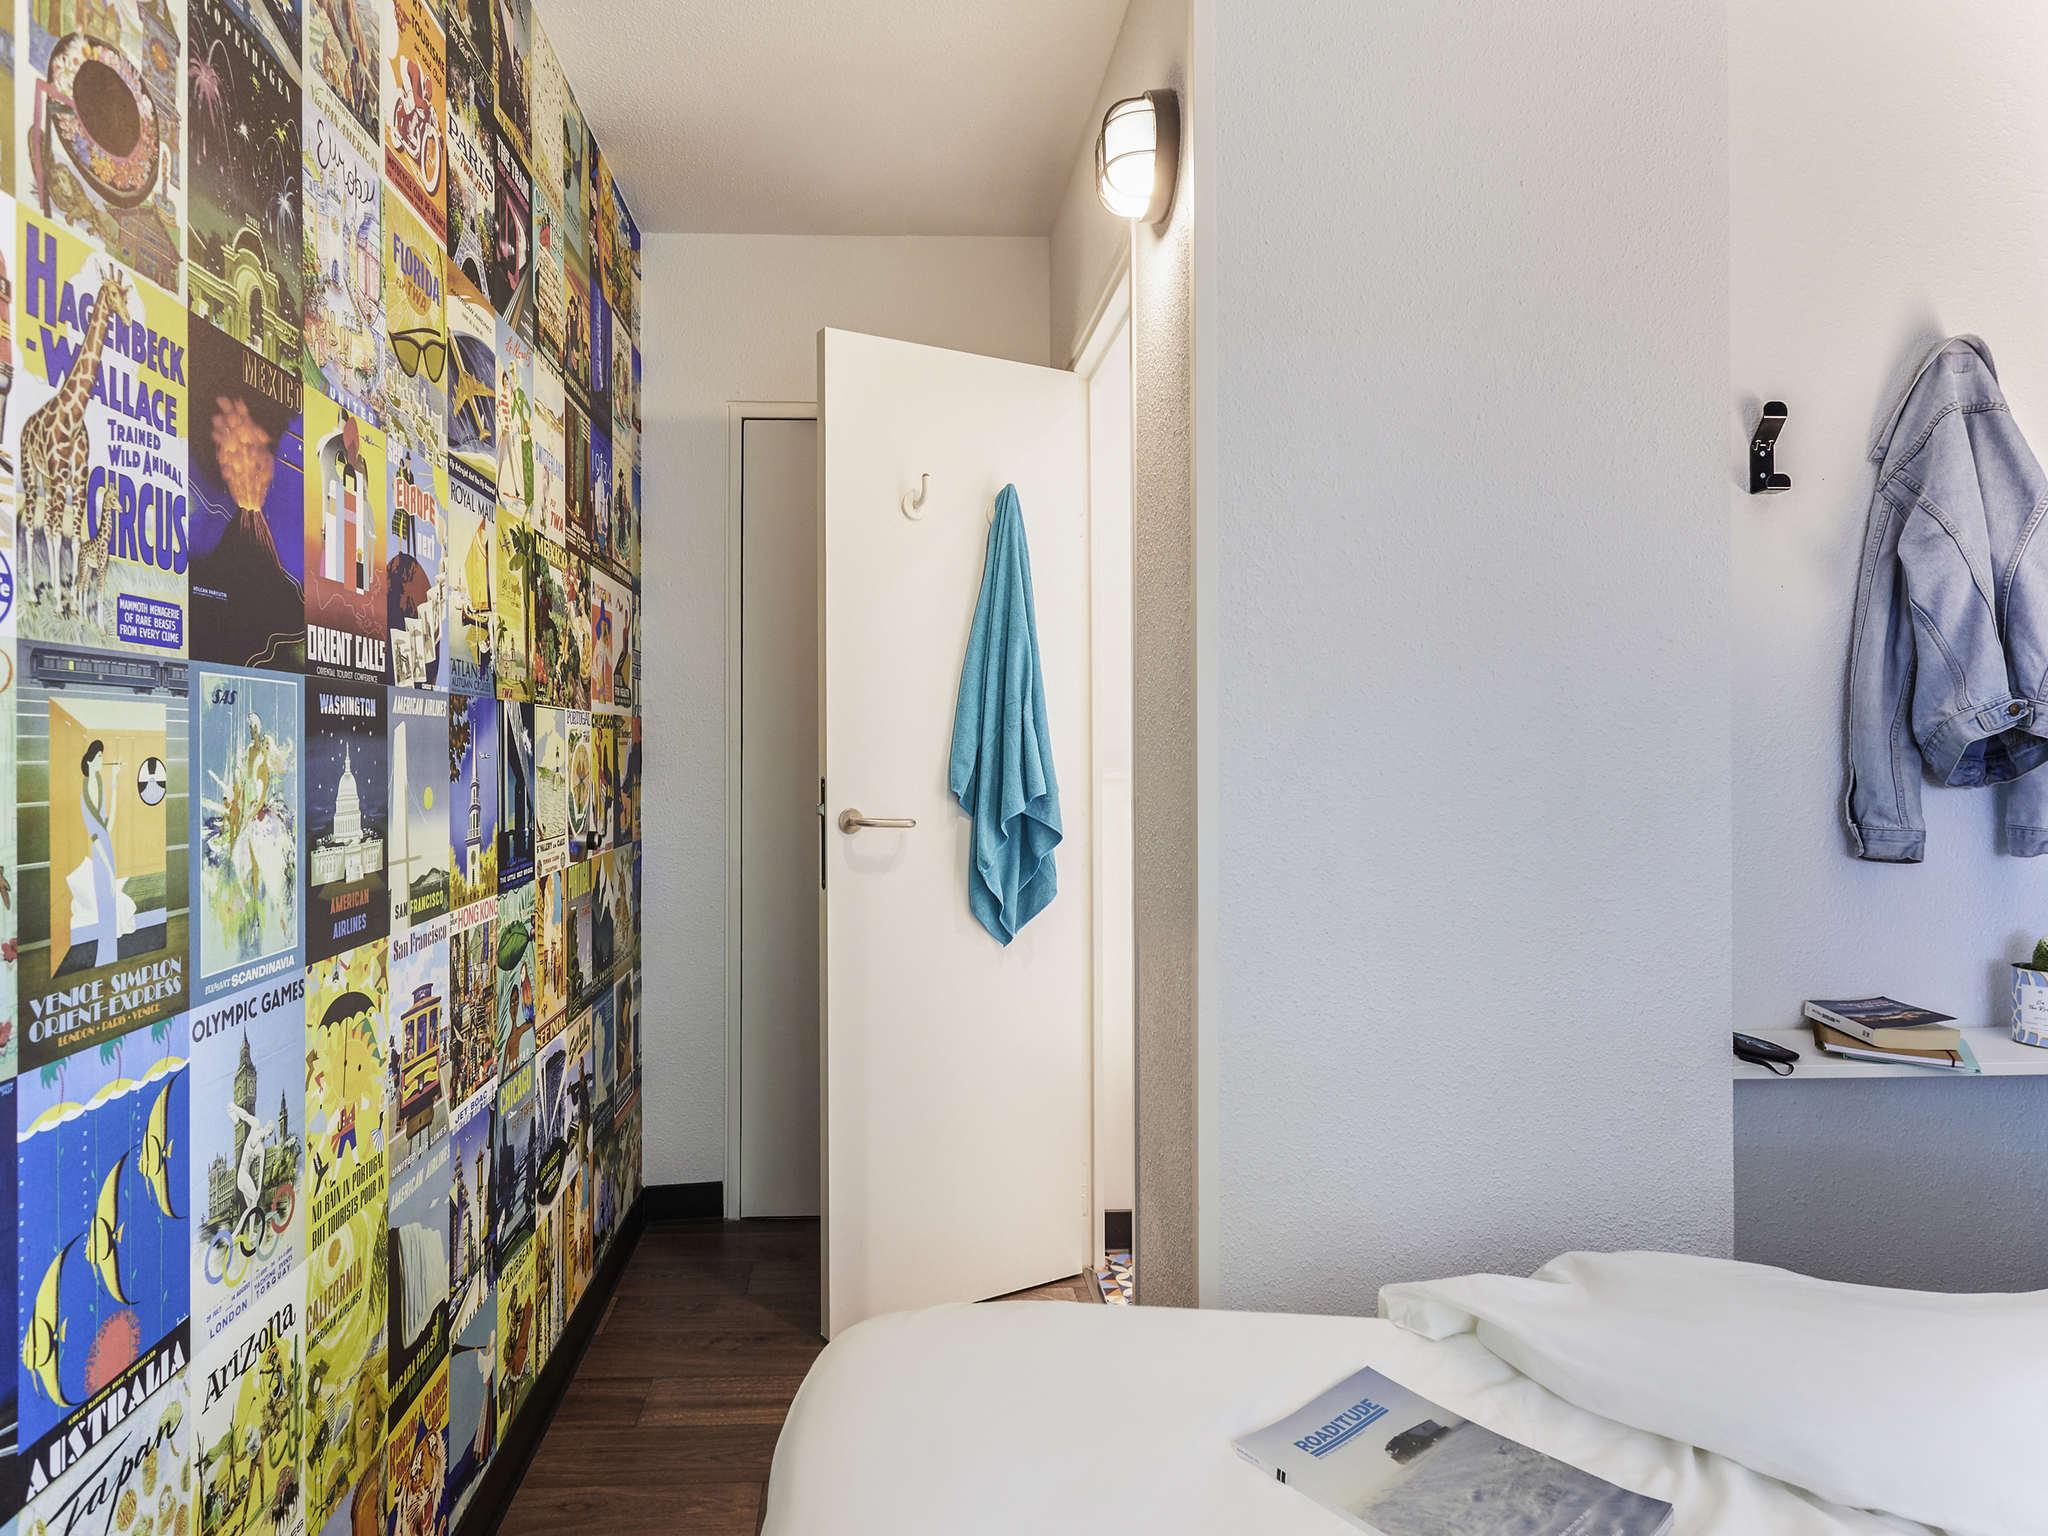 Hotel – hotelF1 Marne la Vallée Collégien